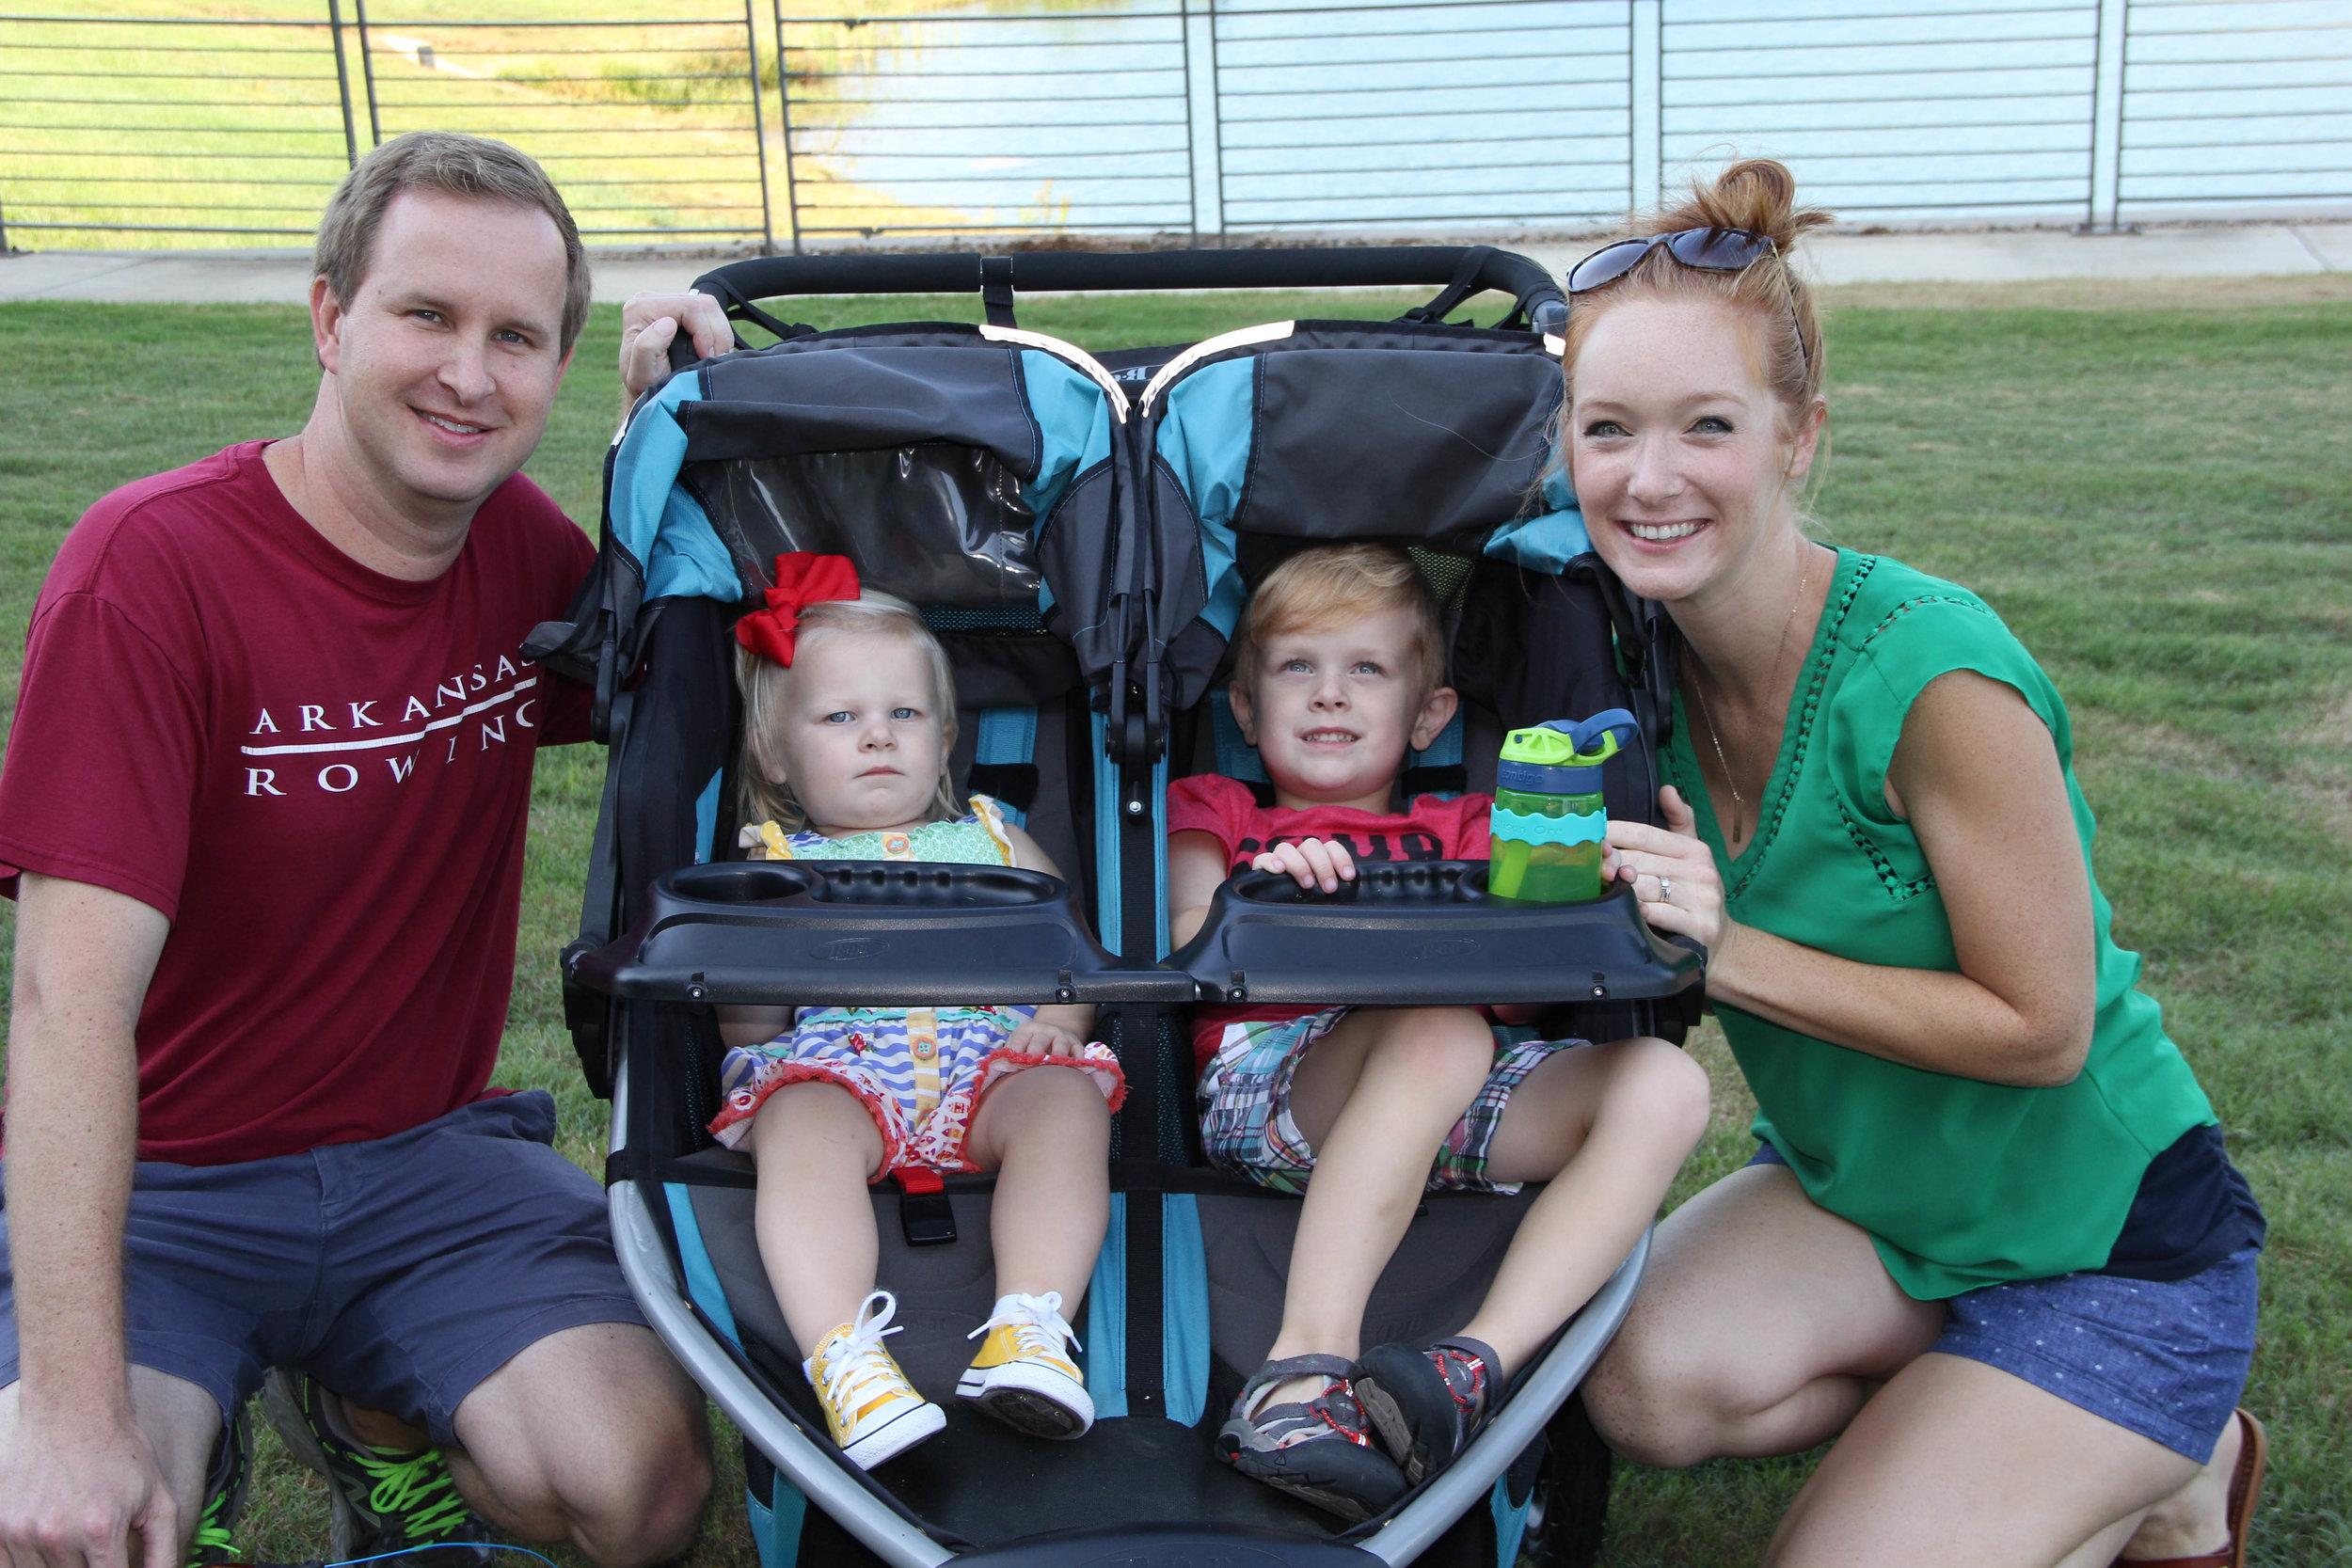 David, Ollie, Ellison, and Laura Orr